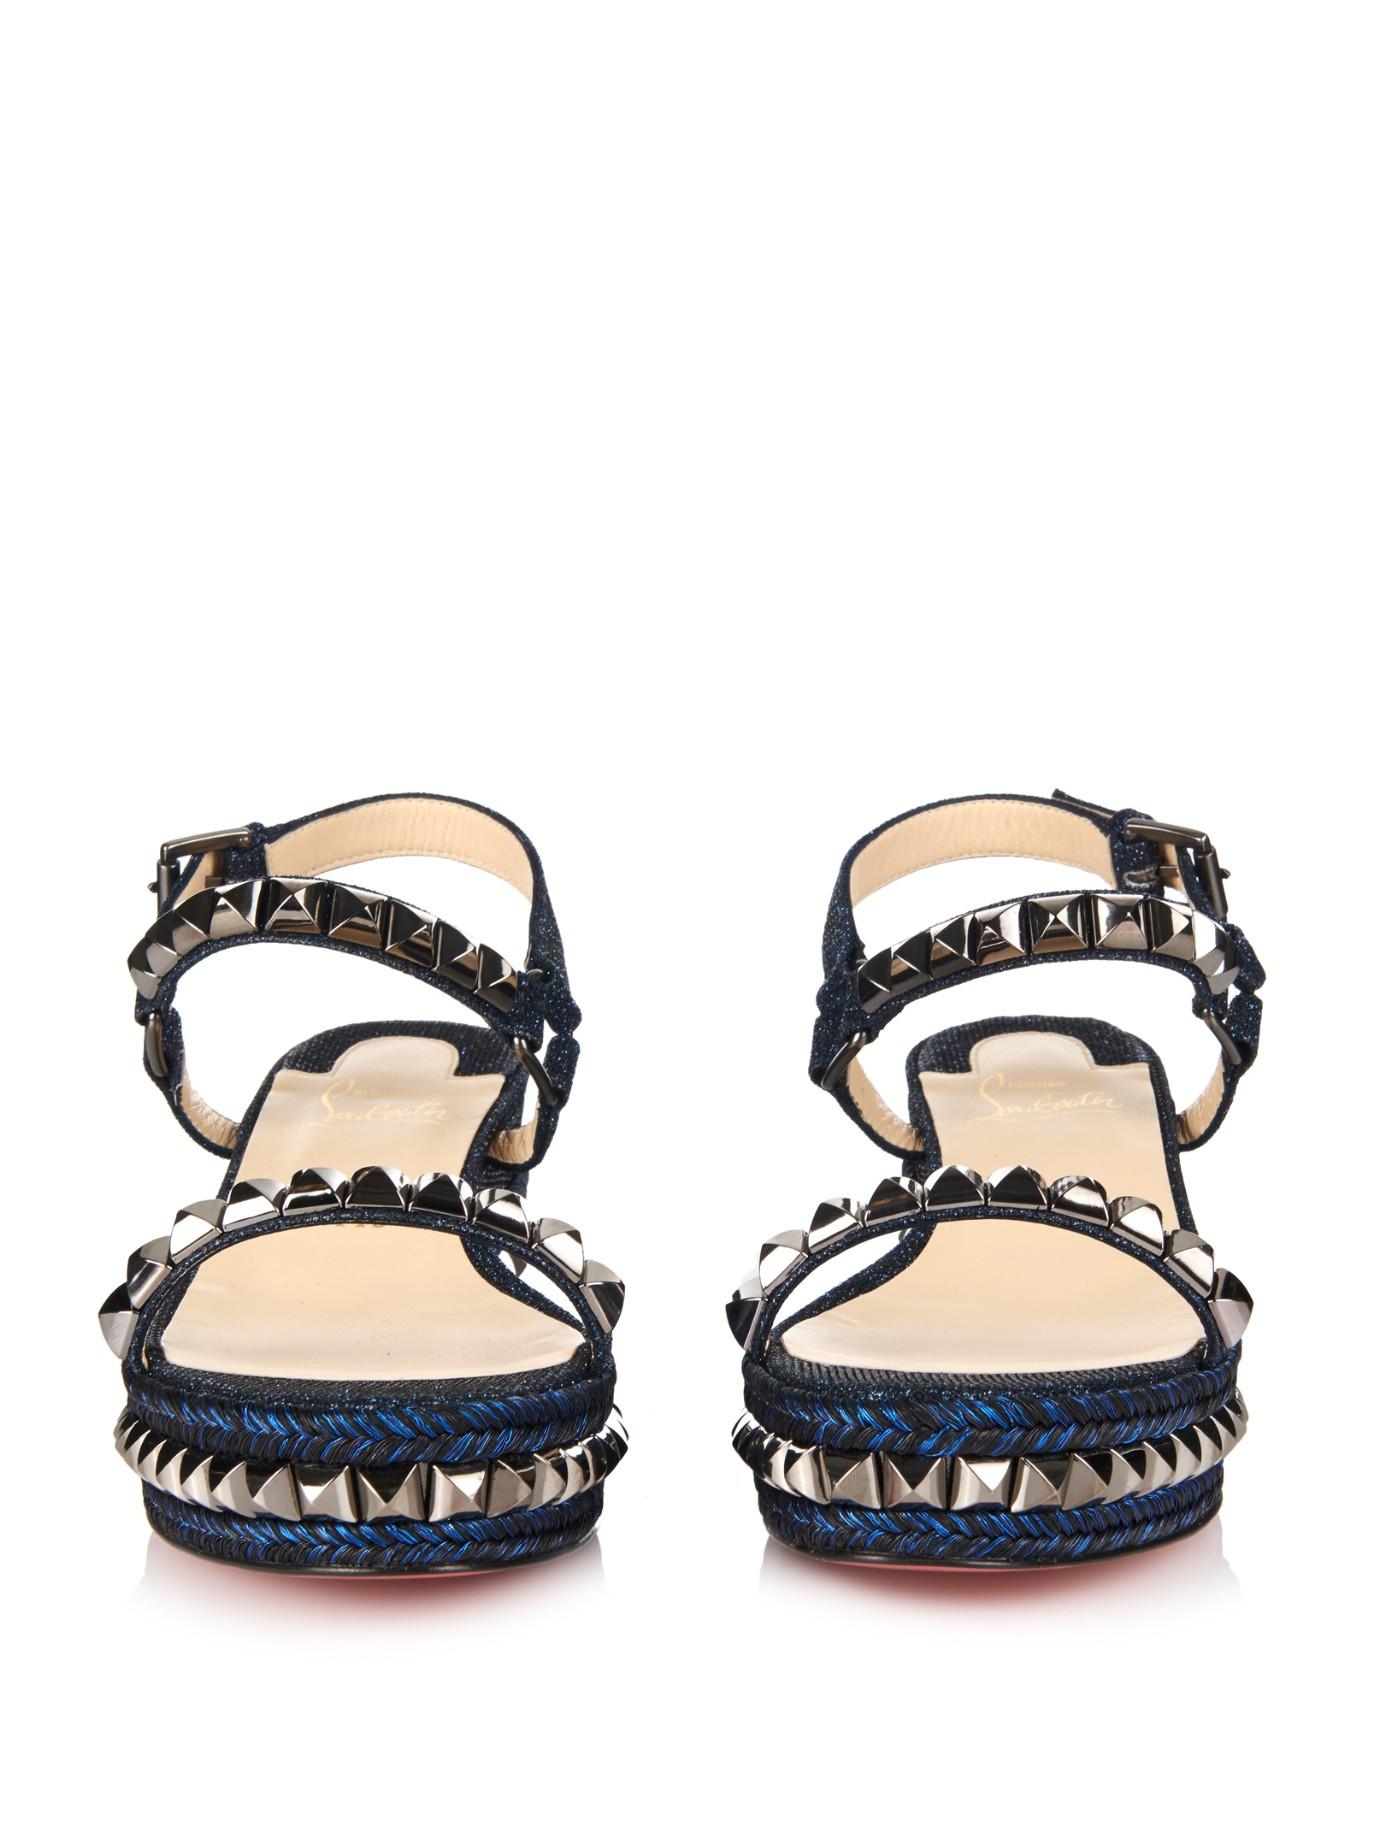 ea9d2efb4b4 Lyst - Christian Louboutin Cataclou 60Mm Flatform Sandals in Blue